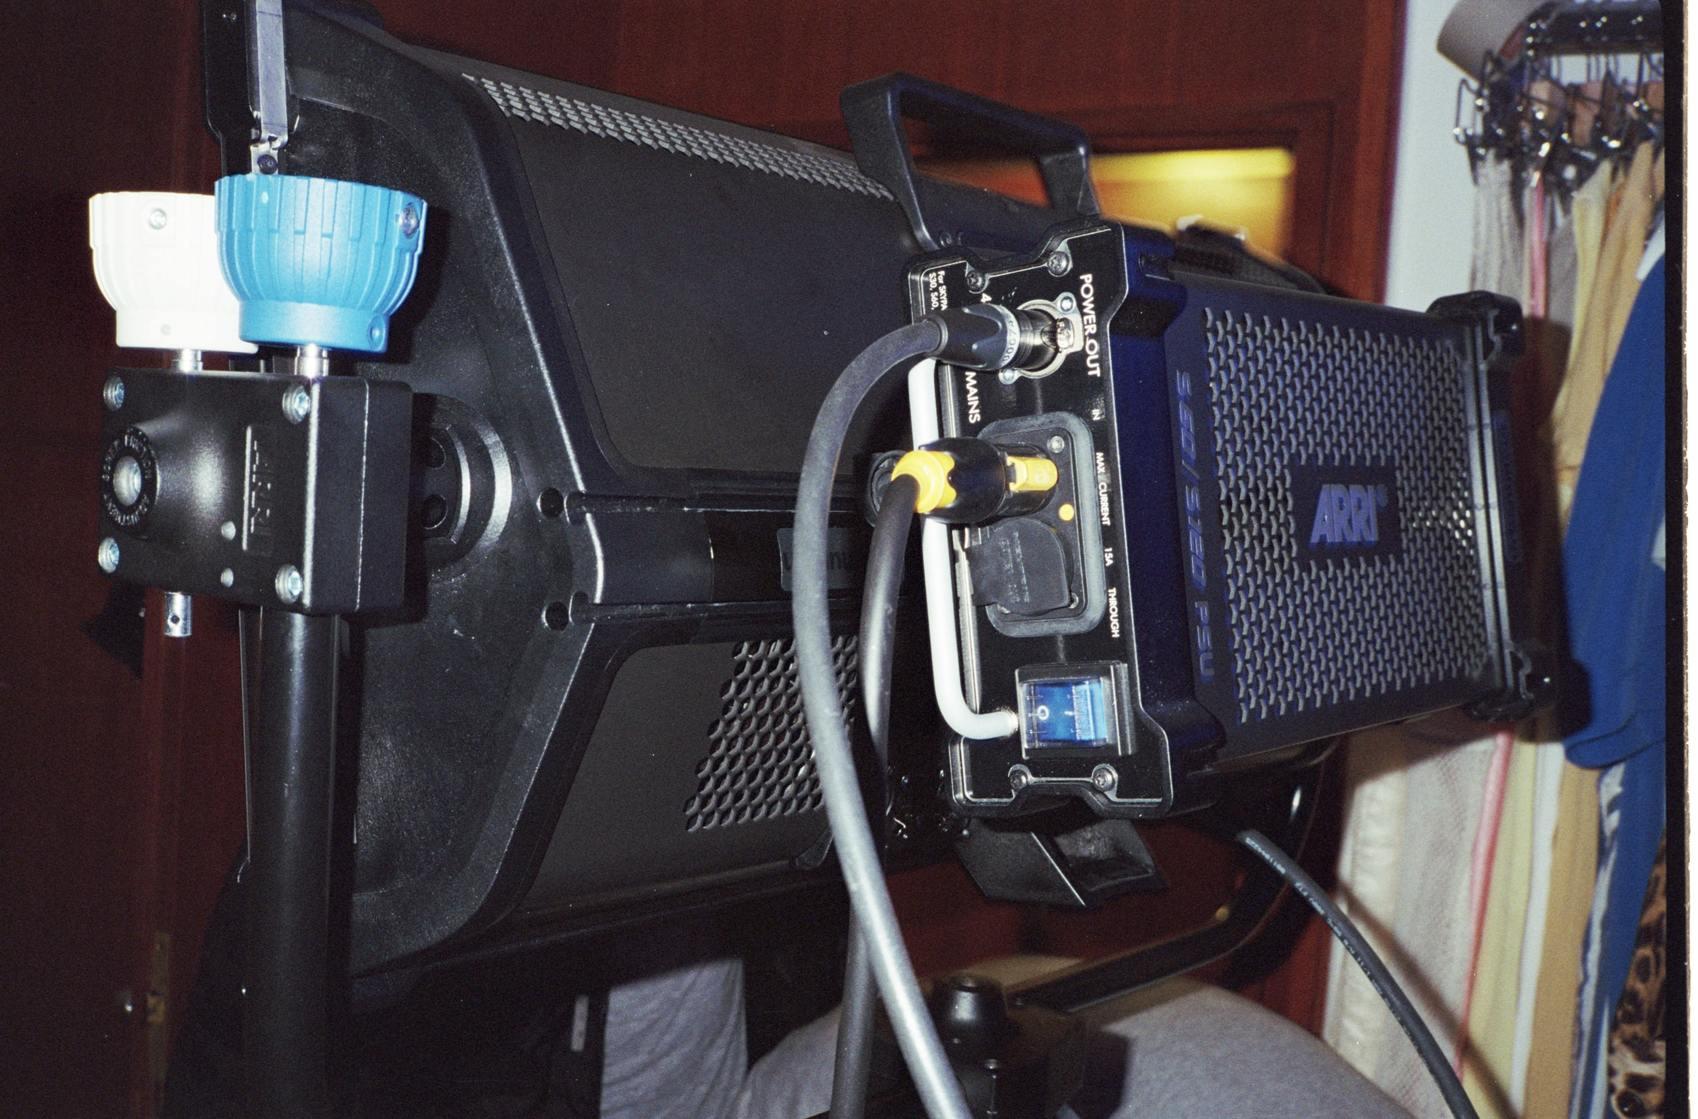 ARRI Skypanel URBAN & UNCUT Studios